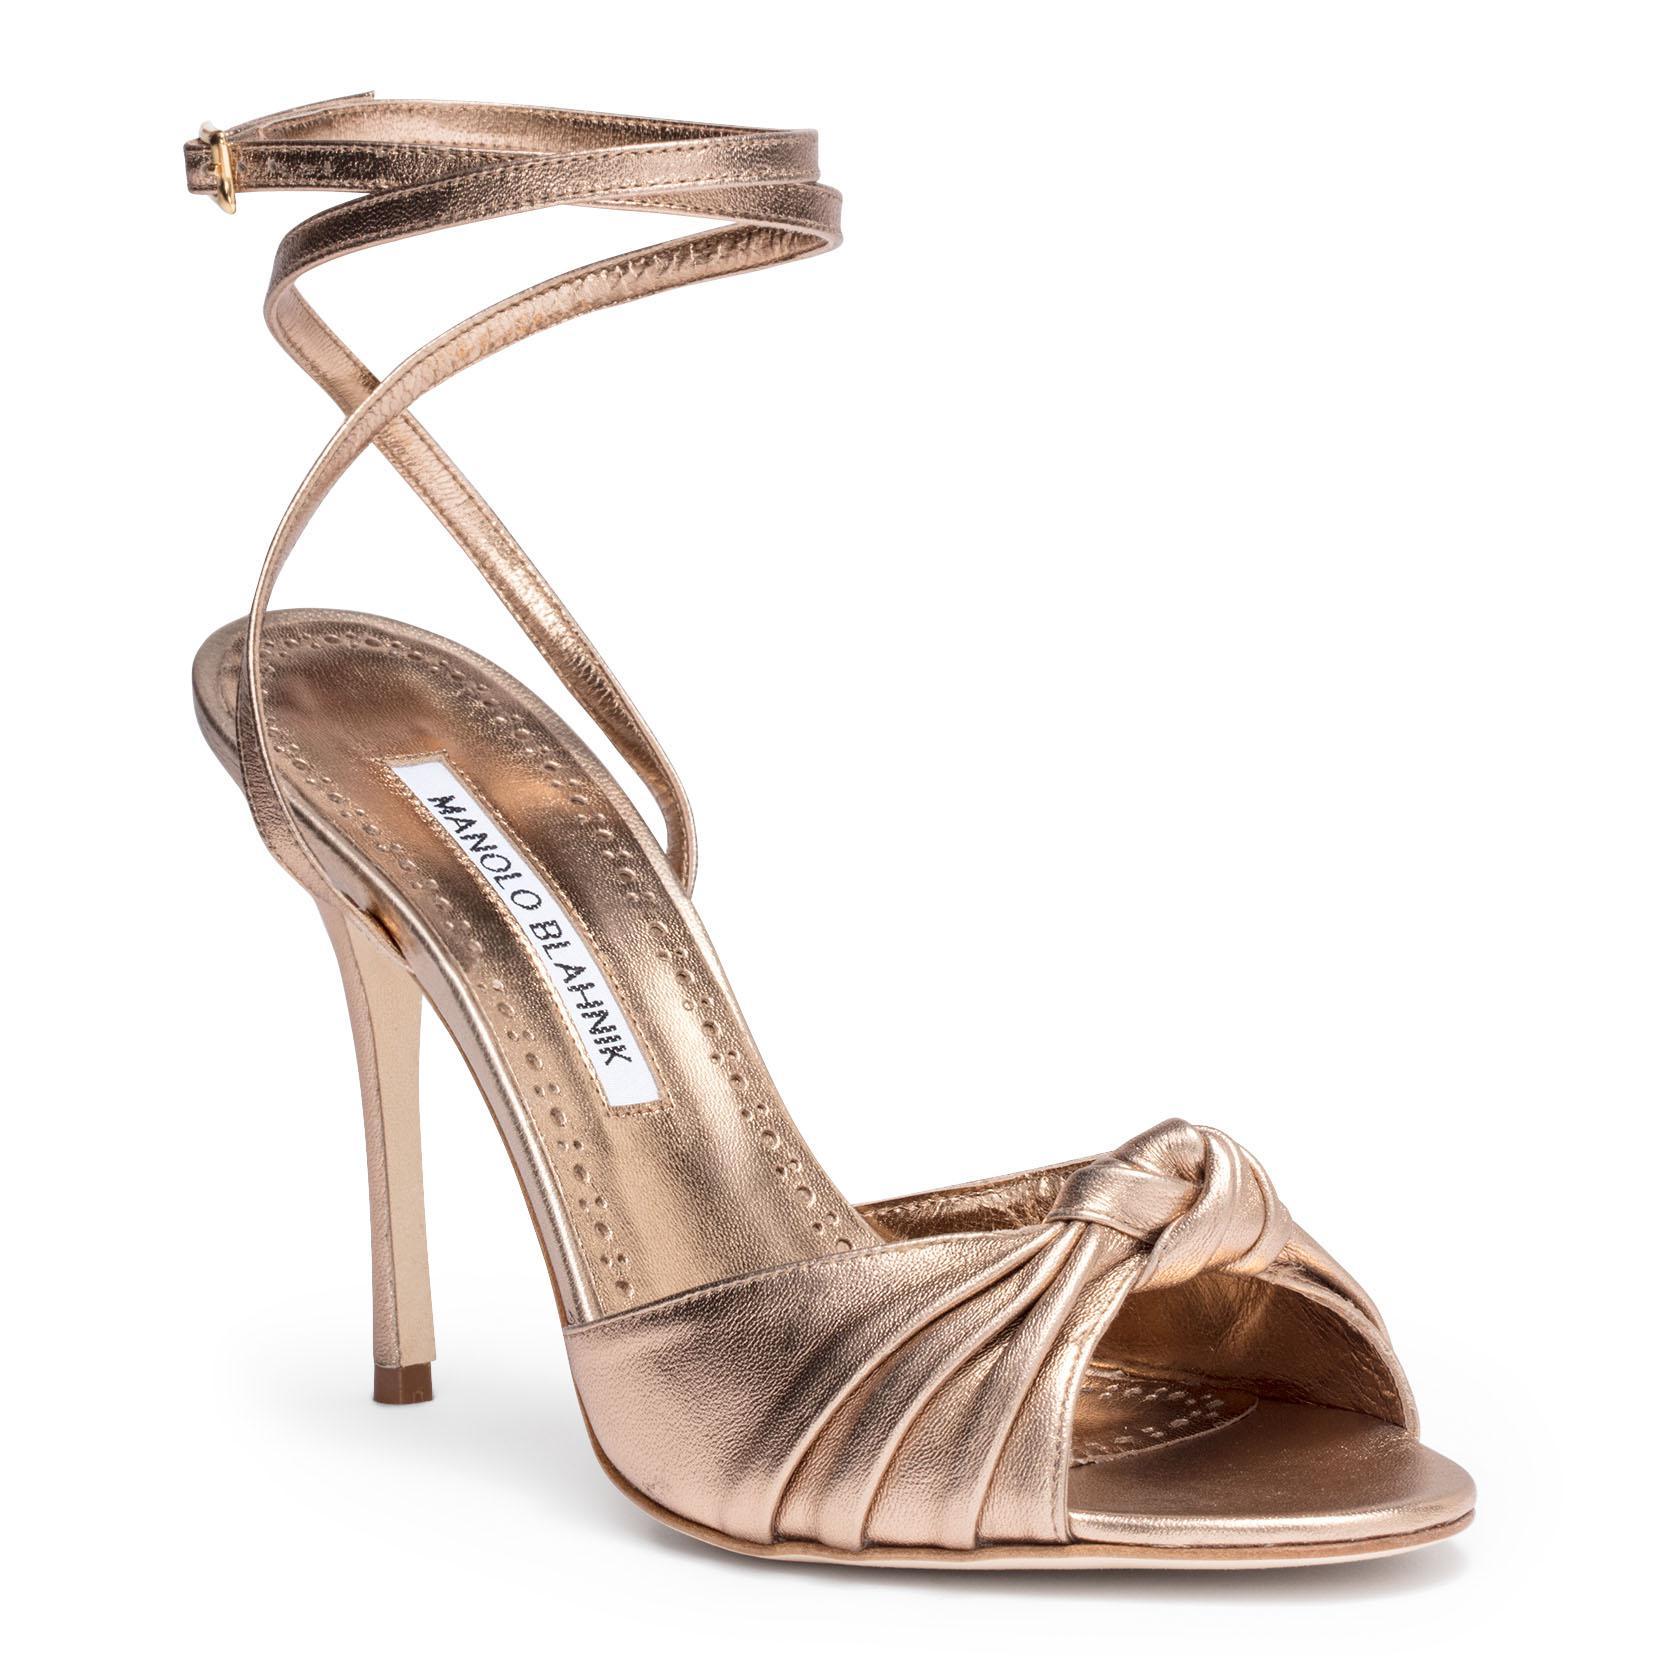 Mumuyesli 70 nappa light gold sandal Manolo Blahnik 2T6fV3lHb